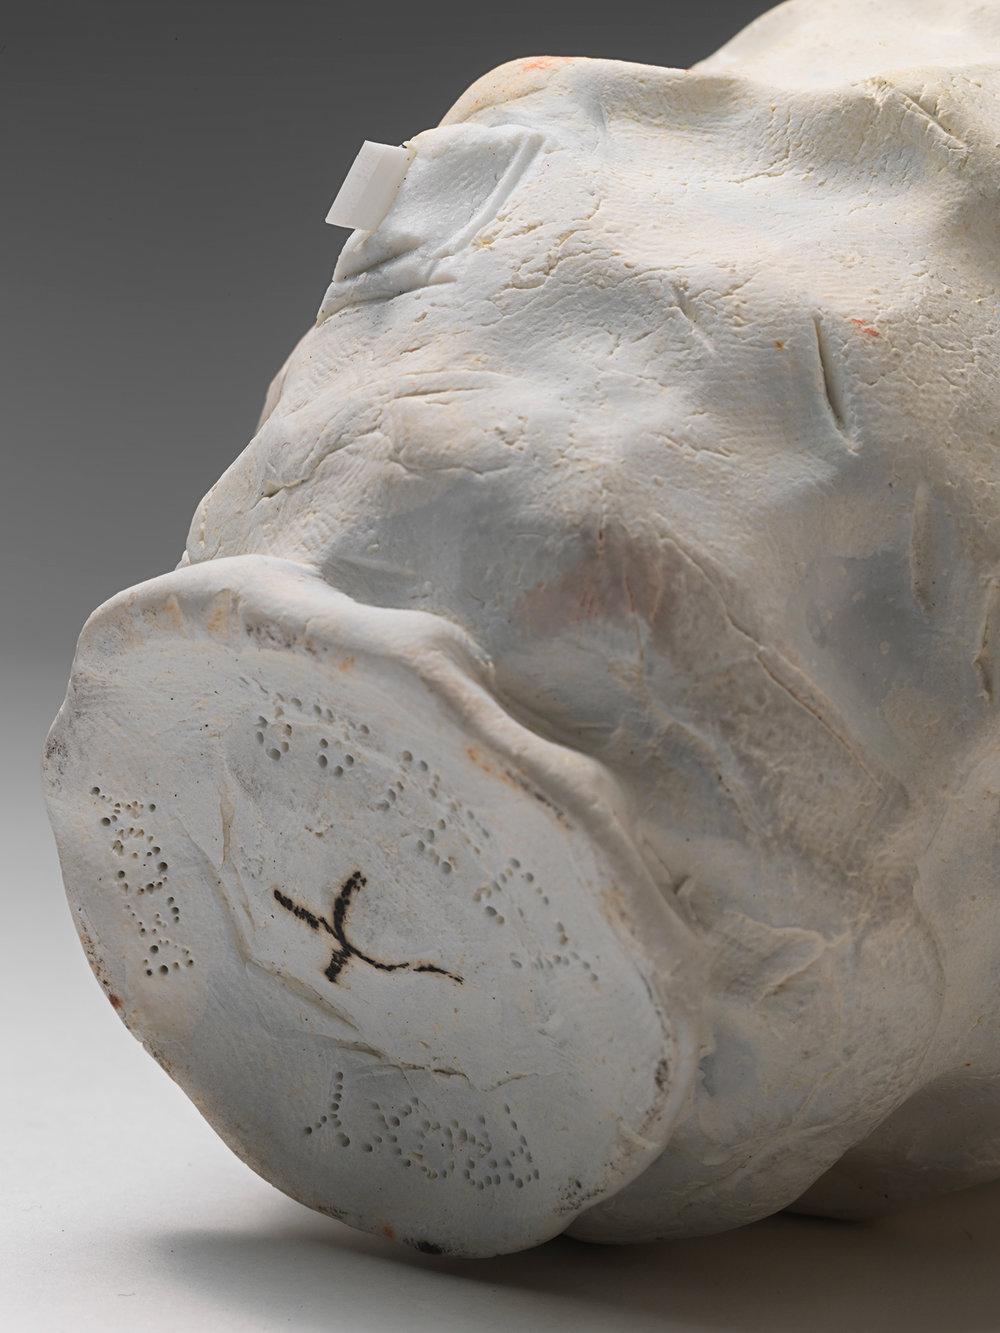 "DECOY_Cup_7 . Detail. Porcelain, porcelain blade, cardboard, granite. 10"" x 9"" x 7"". 2014."